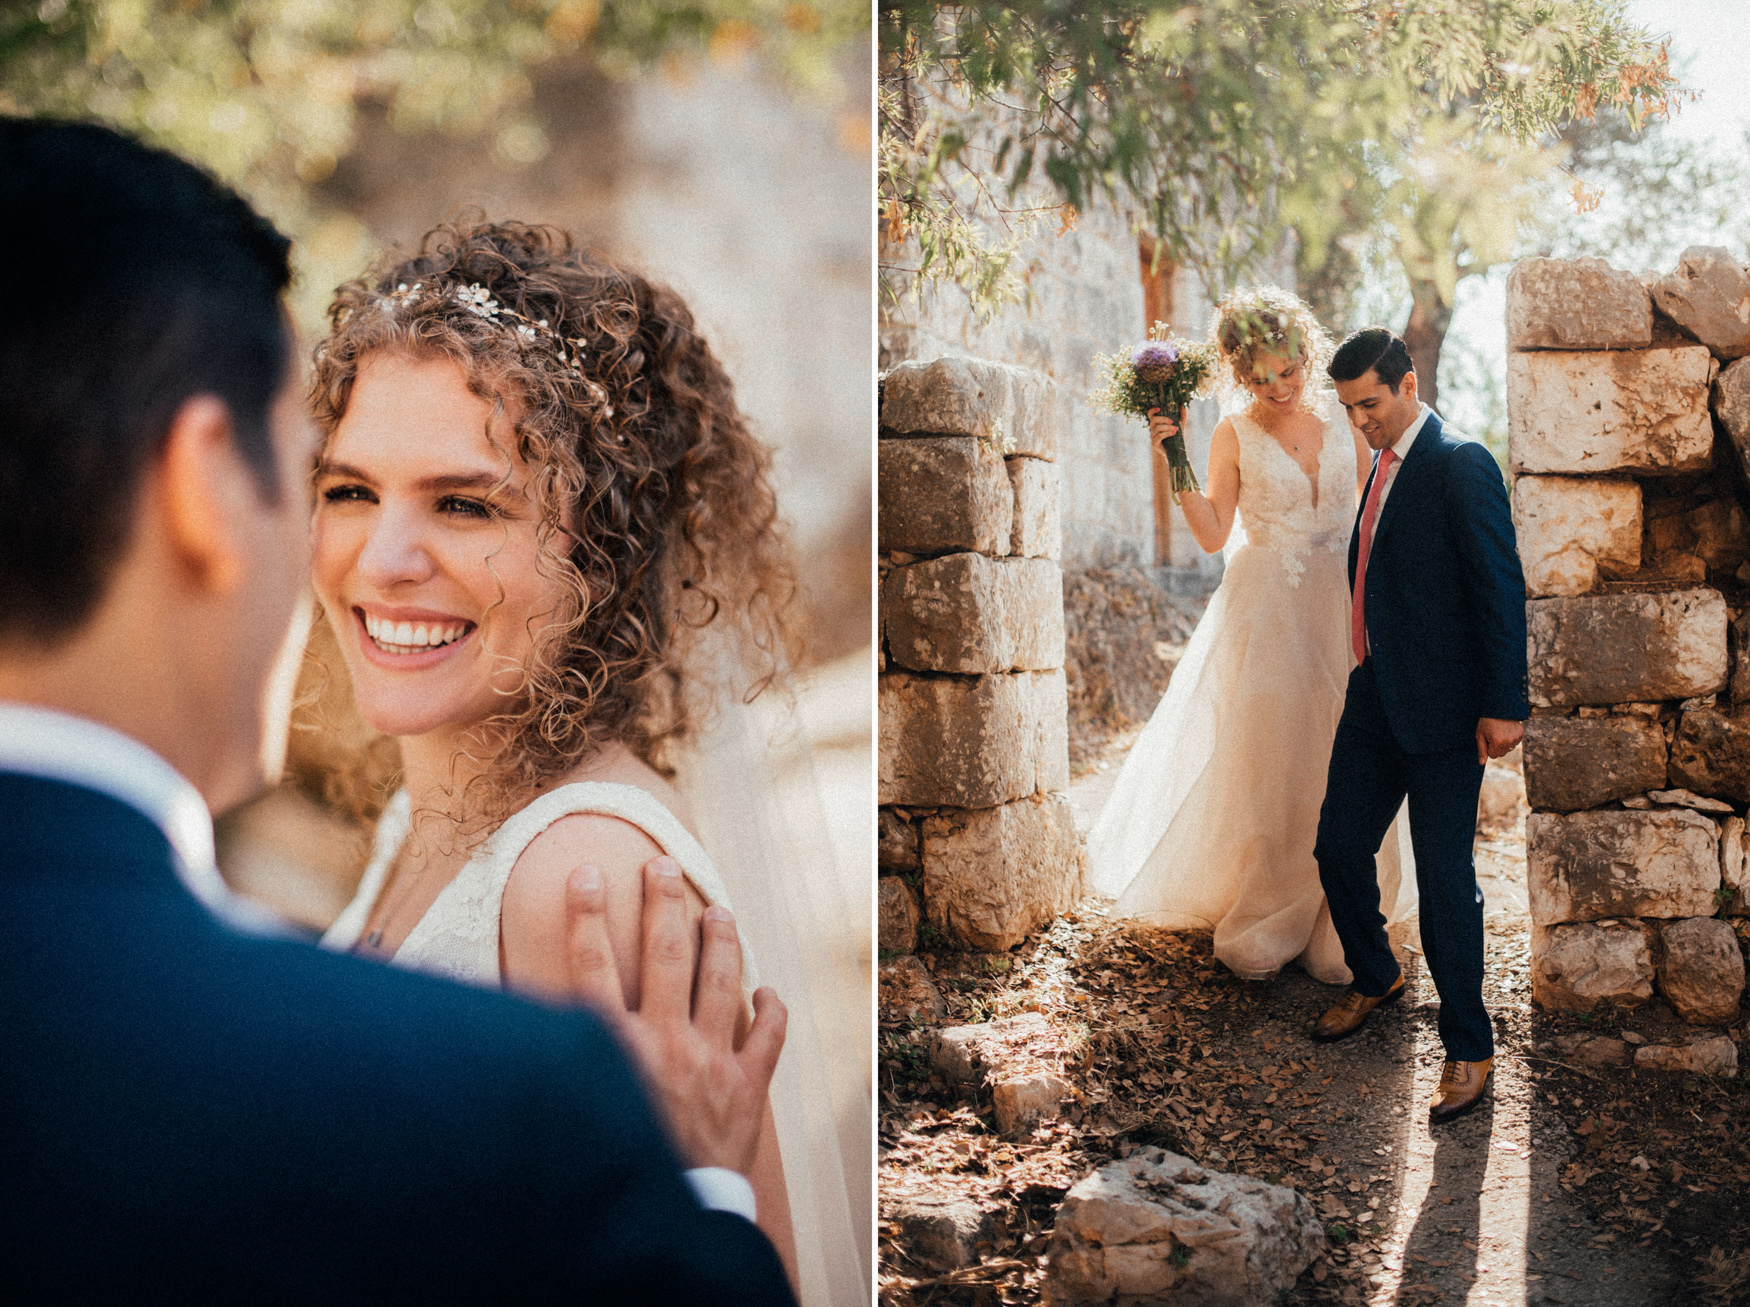 LR4 byblos beirut faraya wedding photographer portraits 004.jpg